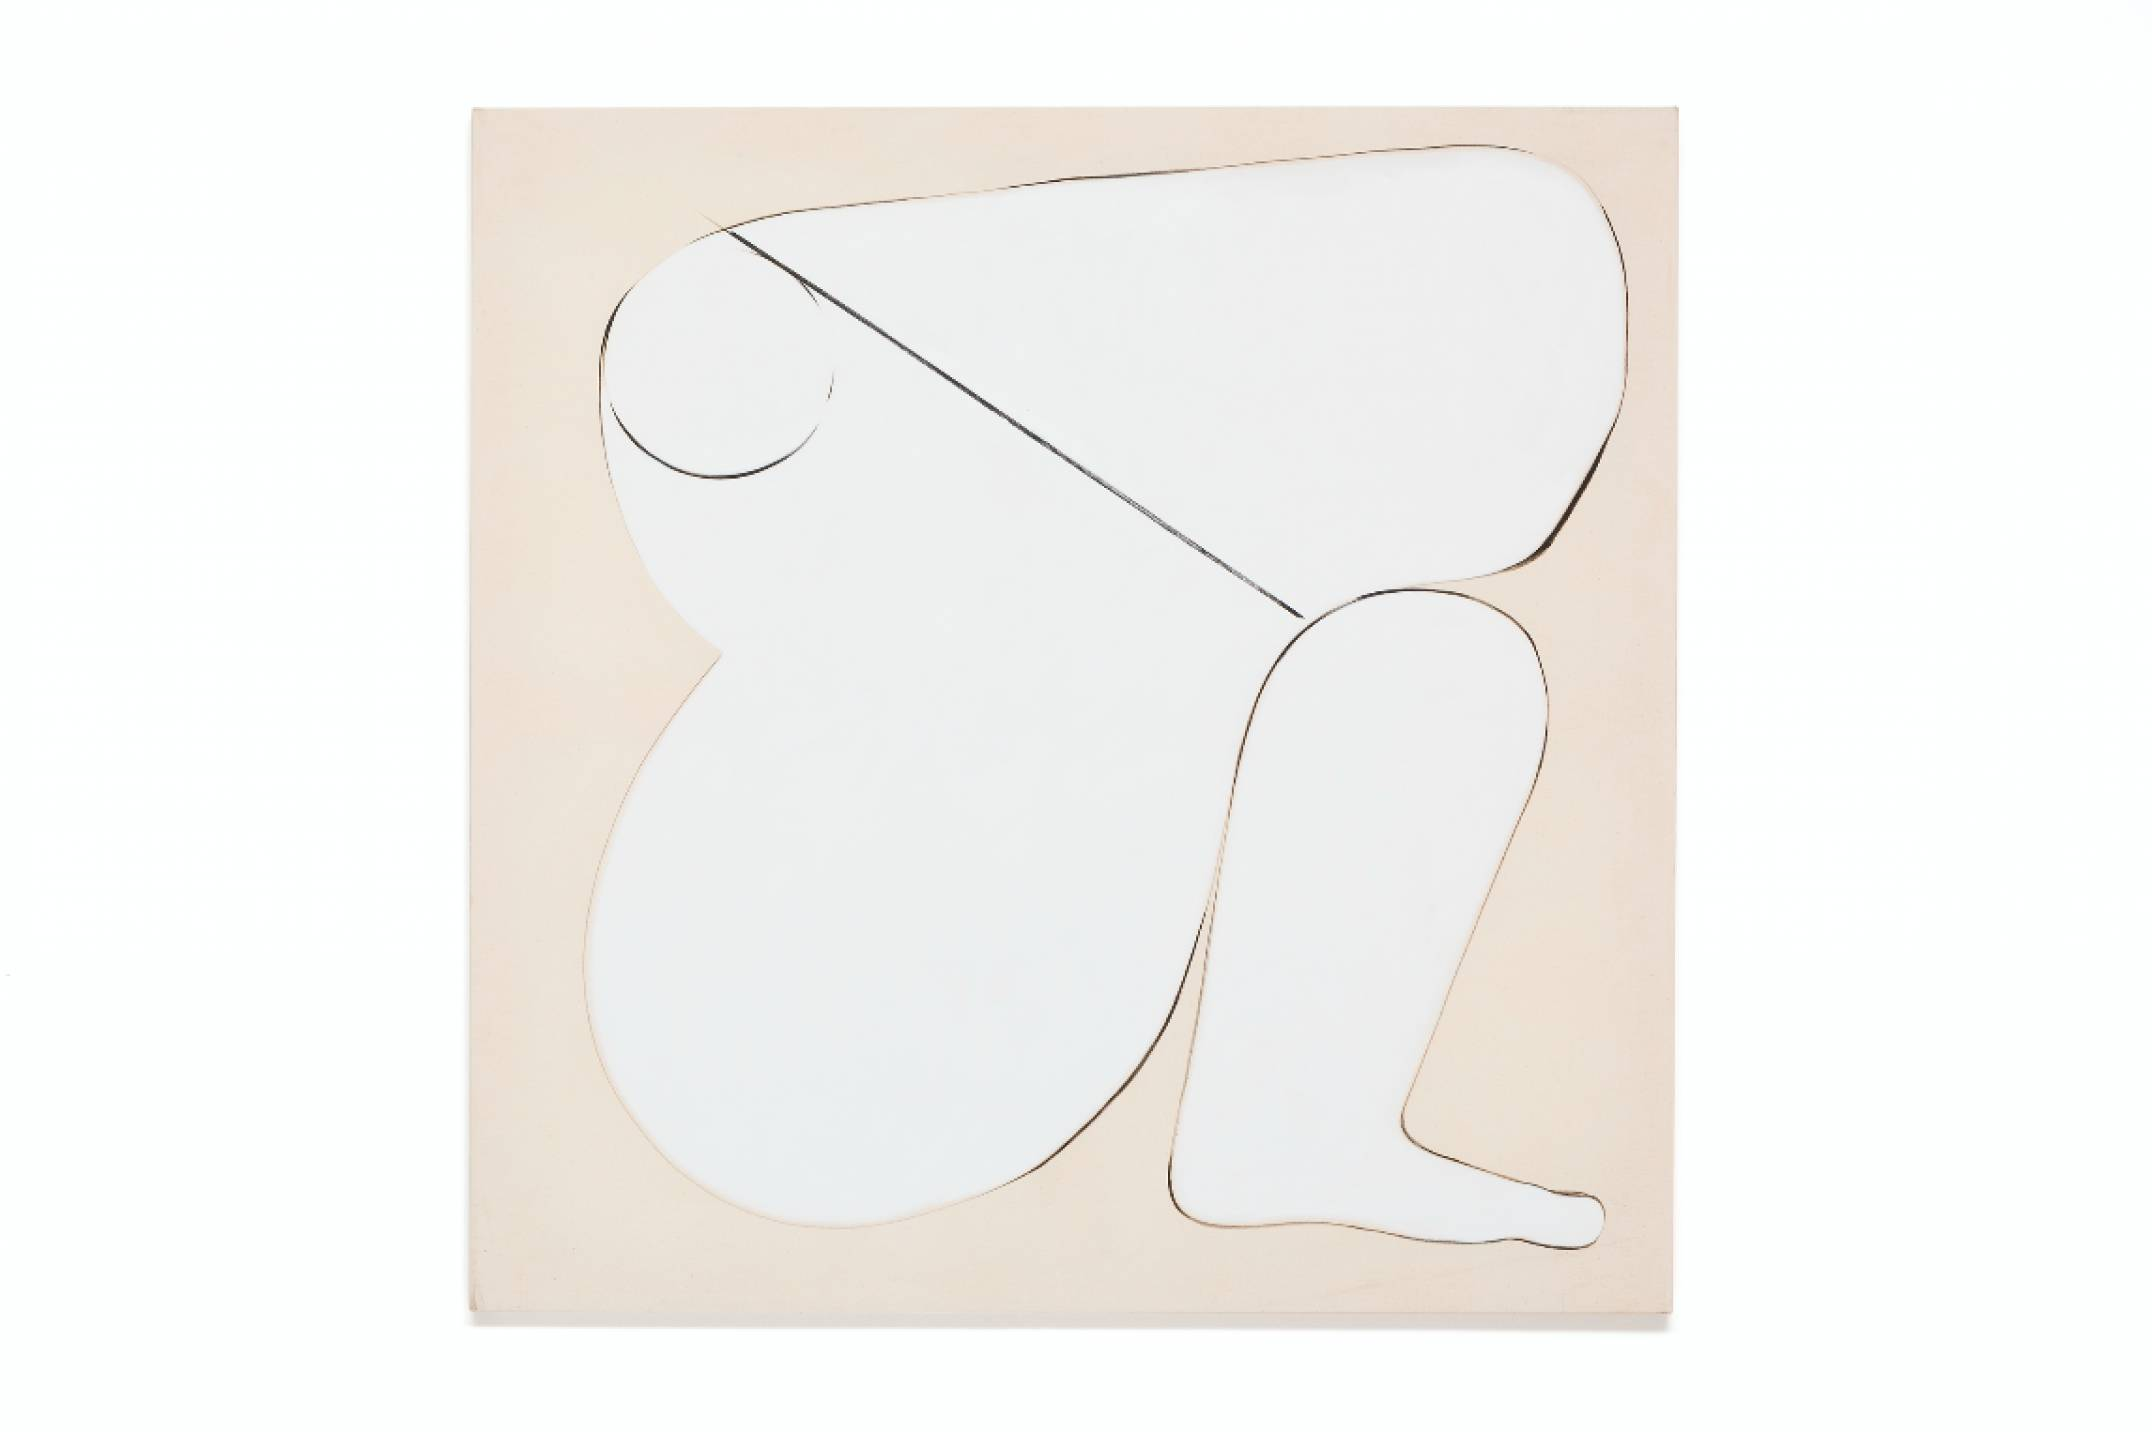 Julie Beaufils, <em>Modern amazone 1</em>, 2017, acrylic and ink on canvas, 130 × 130 cm - Mendes Wood DM